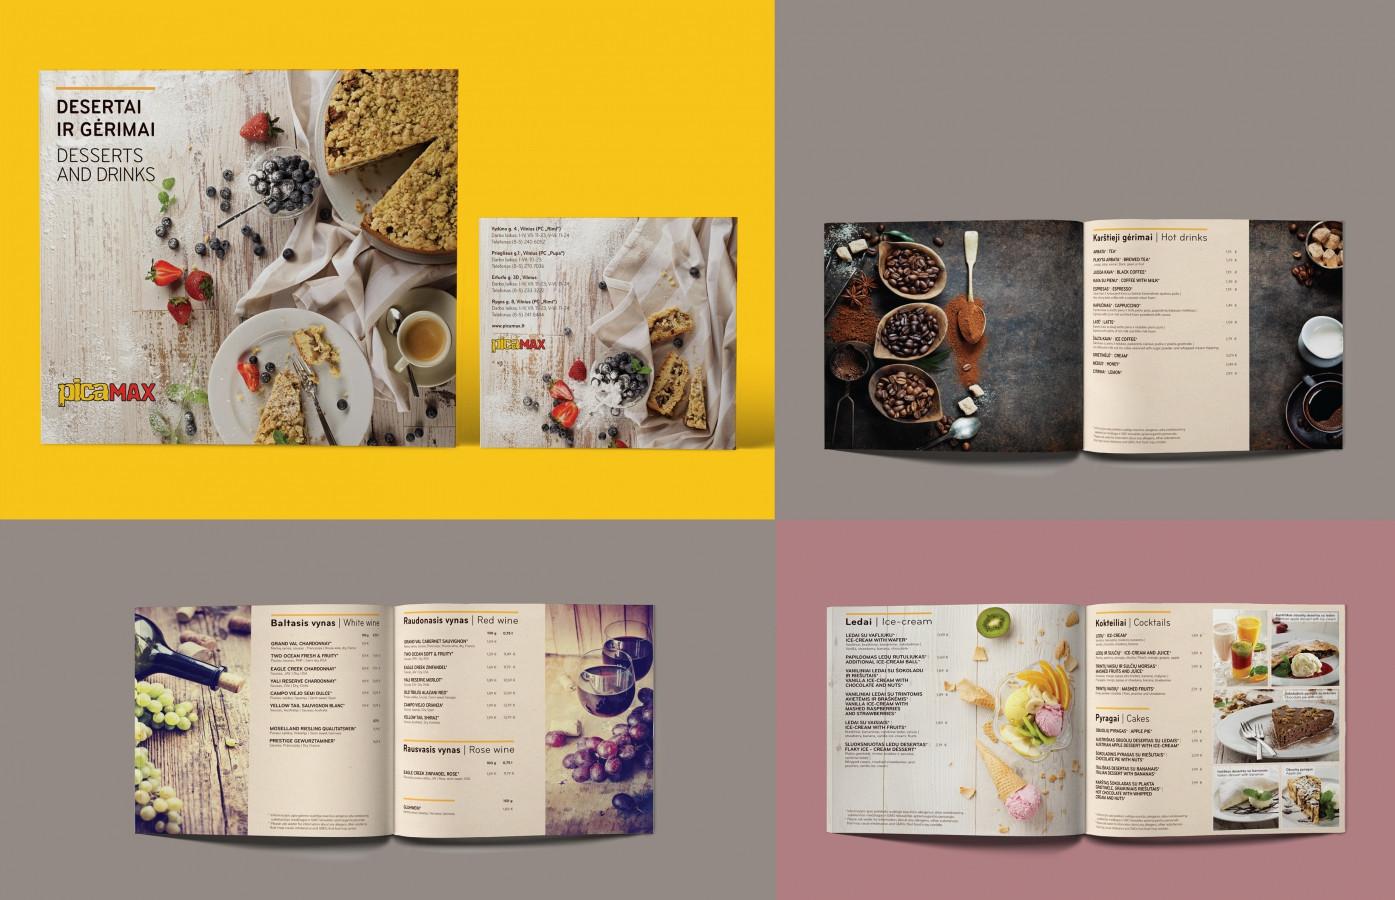 Desertų ir gėrimų meniu / Desserts and drinks menu   PICA MAX Peržiūrėti čia / Review here  http://issuu.com/salvitadesign/docs/gerimu_meniu_web… Idea, food styling, design - Salvita, photography: foto@grafas.lt, Shutterstock